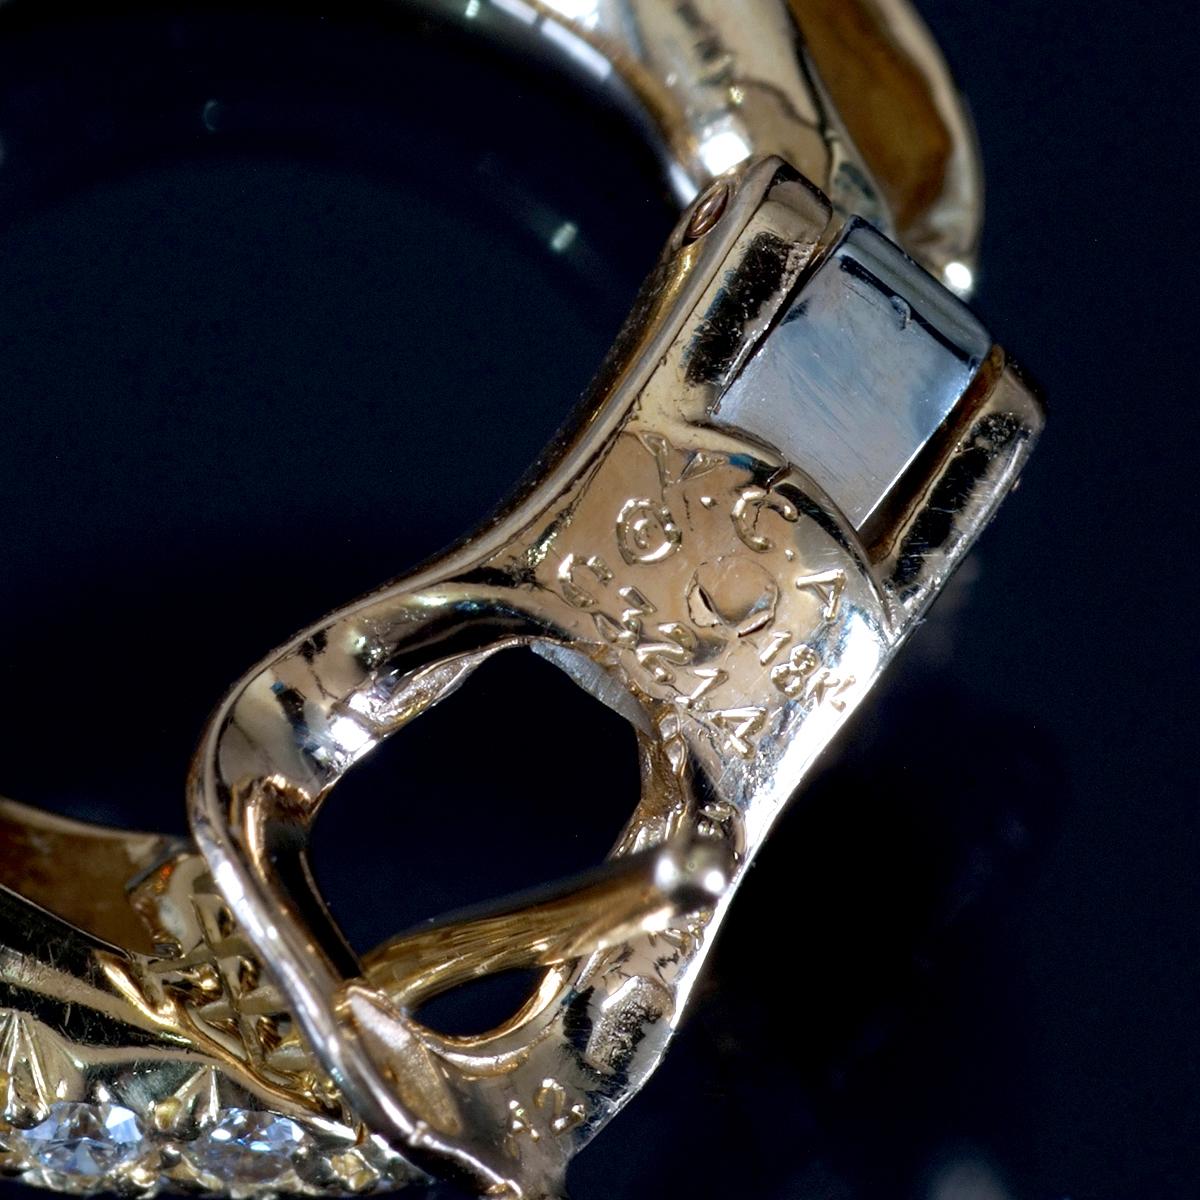 E9112【VAN CLEEF&ARPELS】ヴァンクリーフ&アーペル 絶品ダイヤ 最高級18金シングルピアス 重量4.38g 幅19.1×5.0mm 【買取&下取可能】_画像2